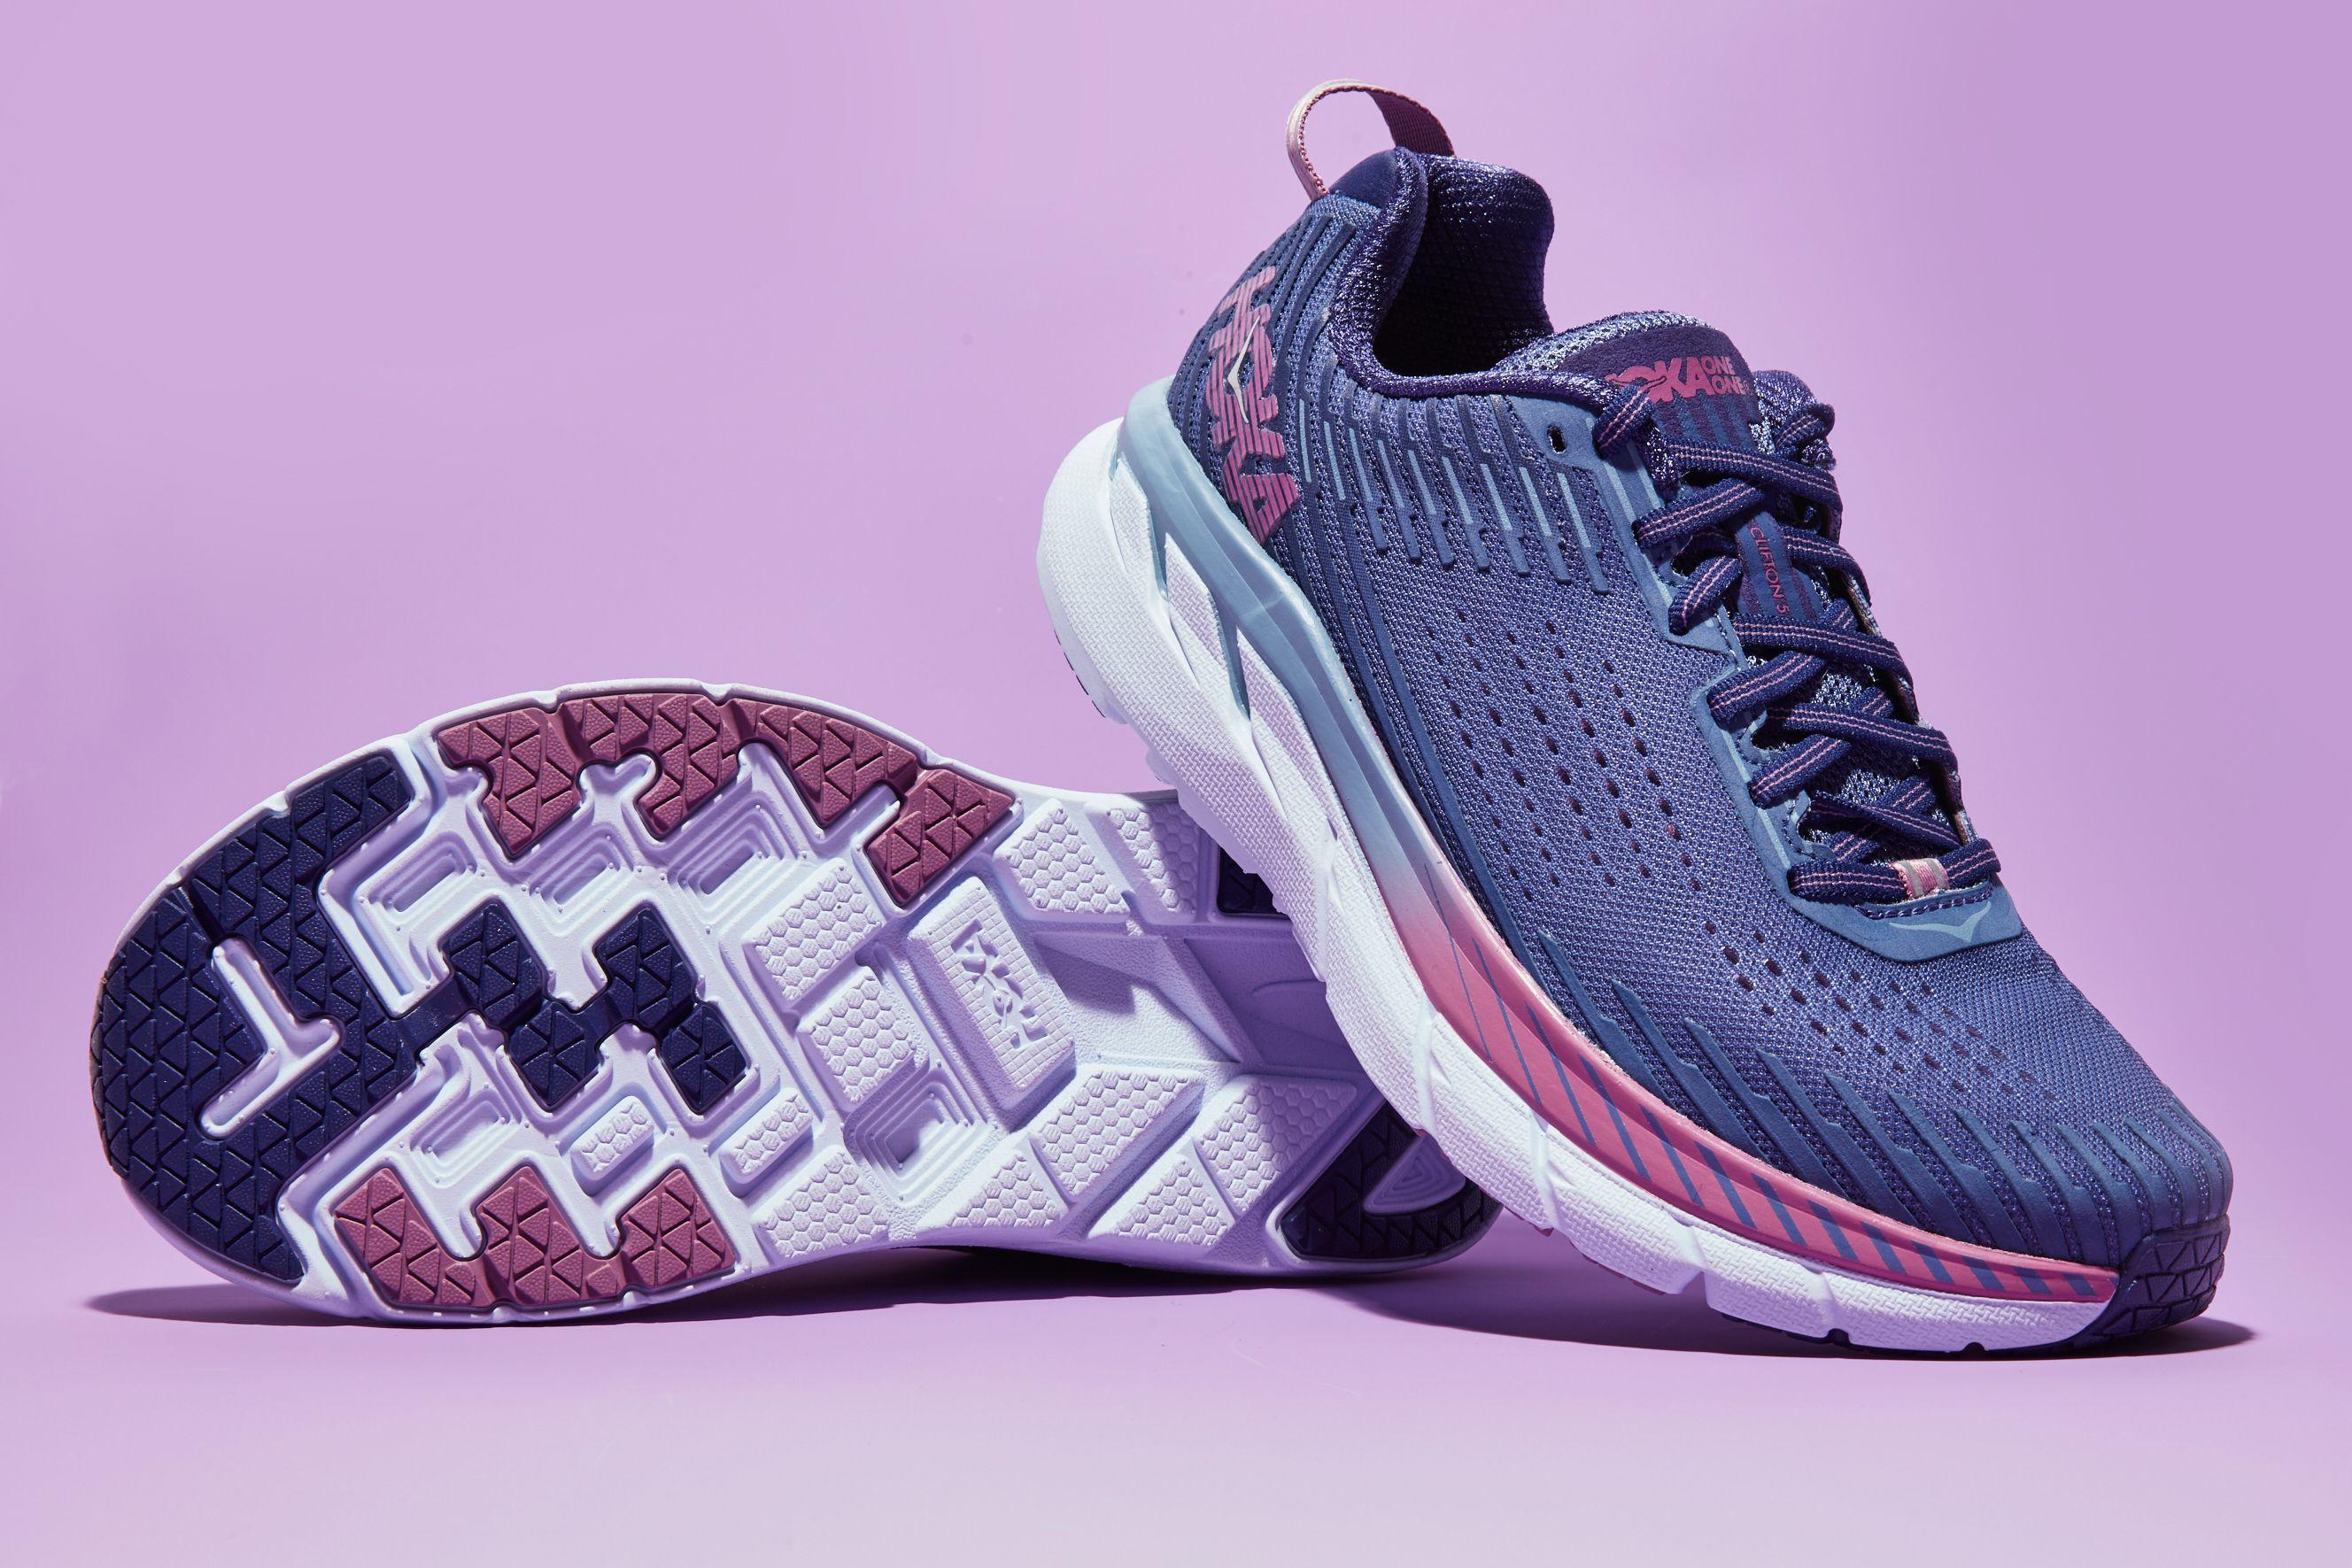 2bd197377d4 Hoka One One Clifton 5 Trainer - Lightweight Running Shoes